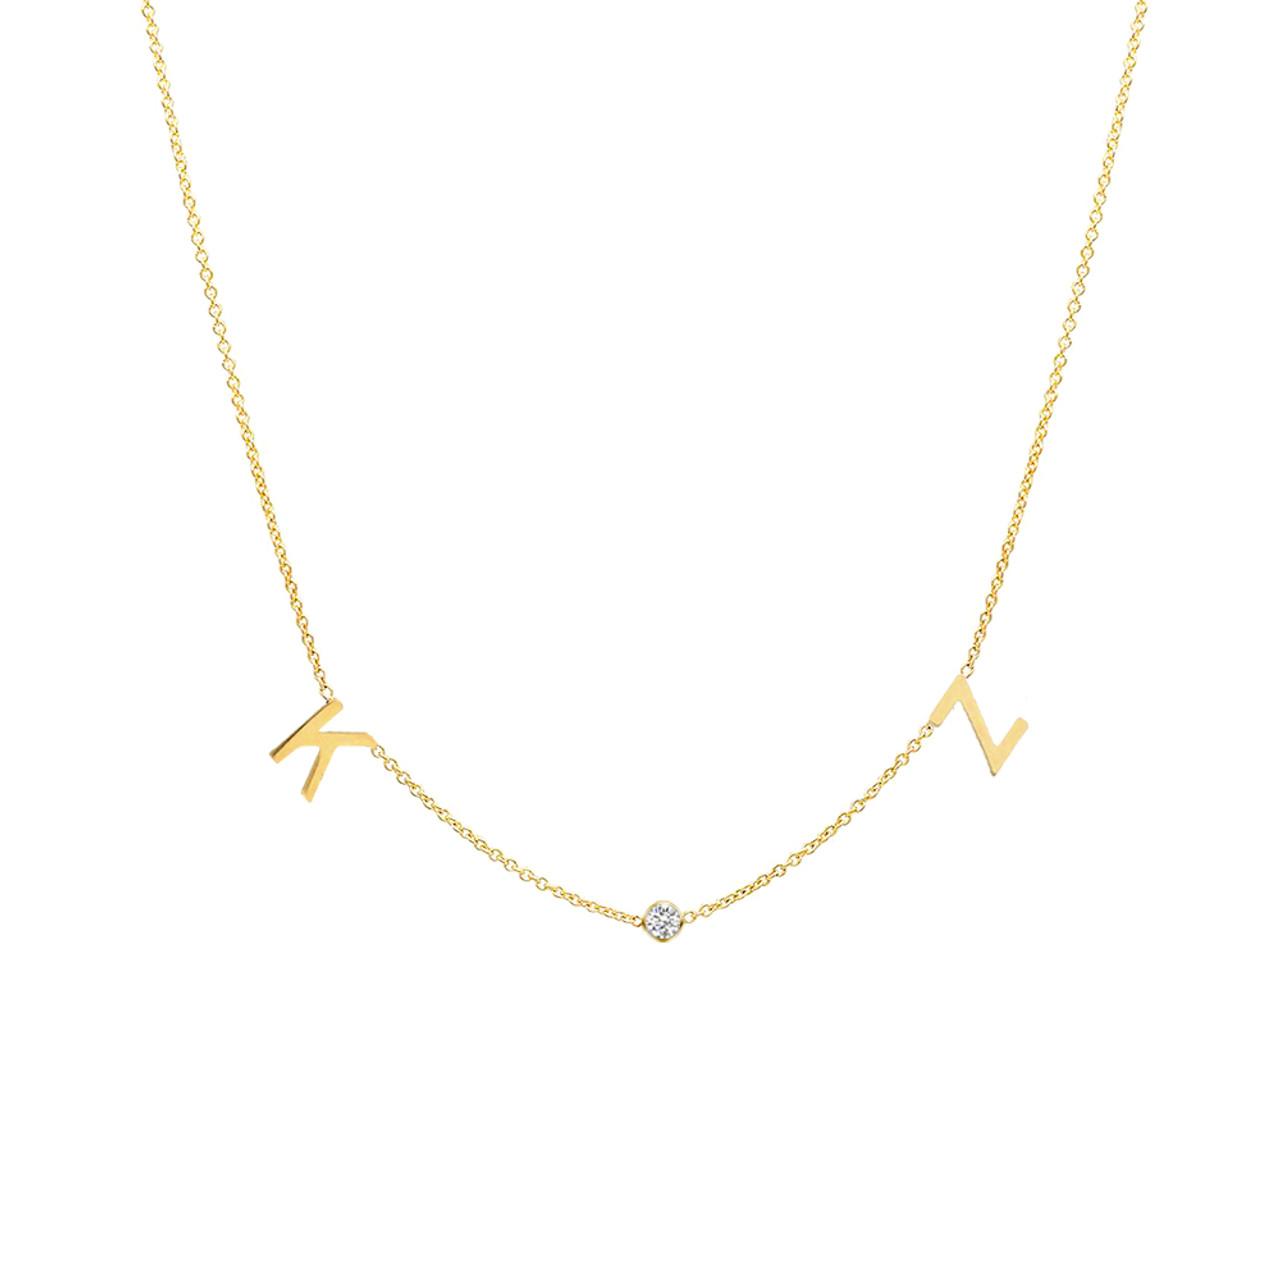 6a784c86e4a65 14K gold space letter and diamond bezel necklace